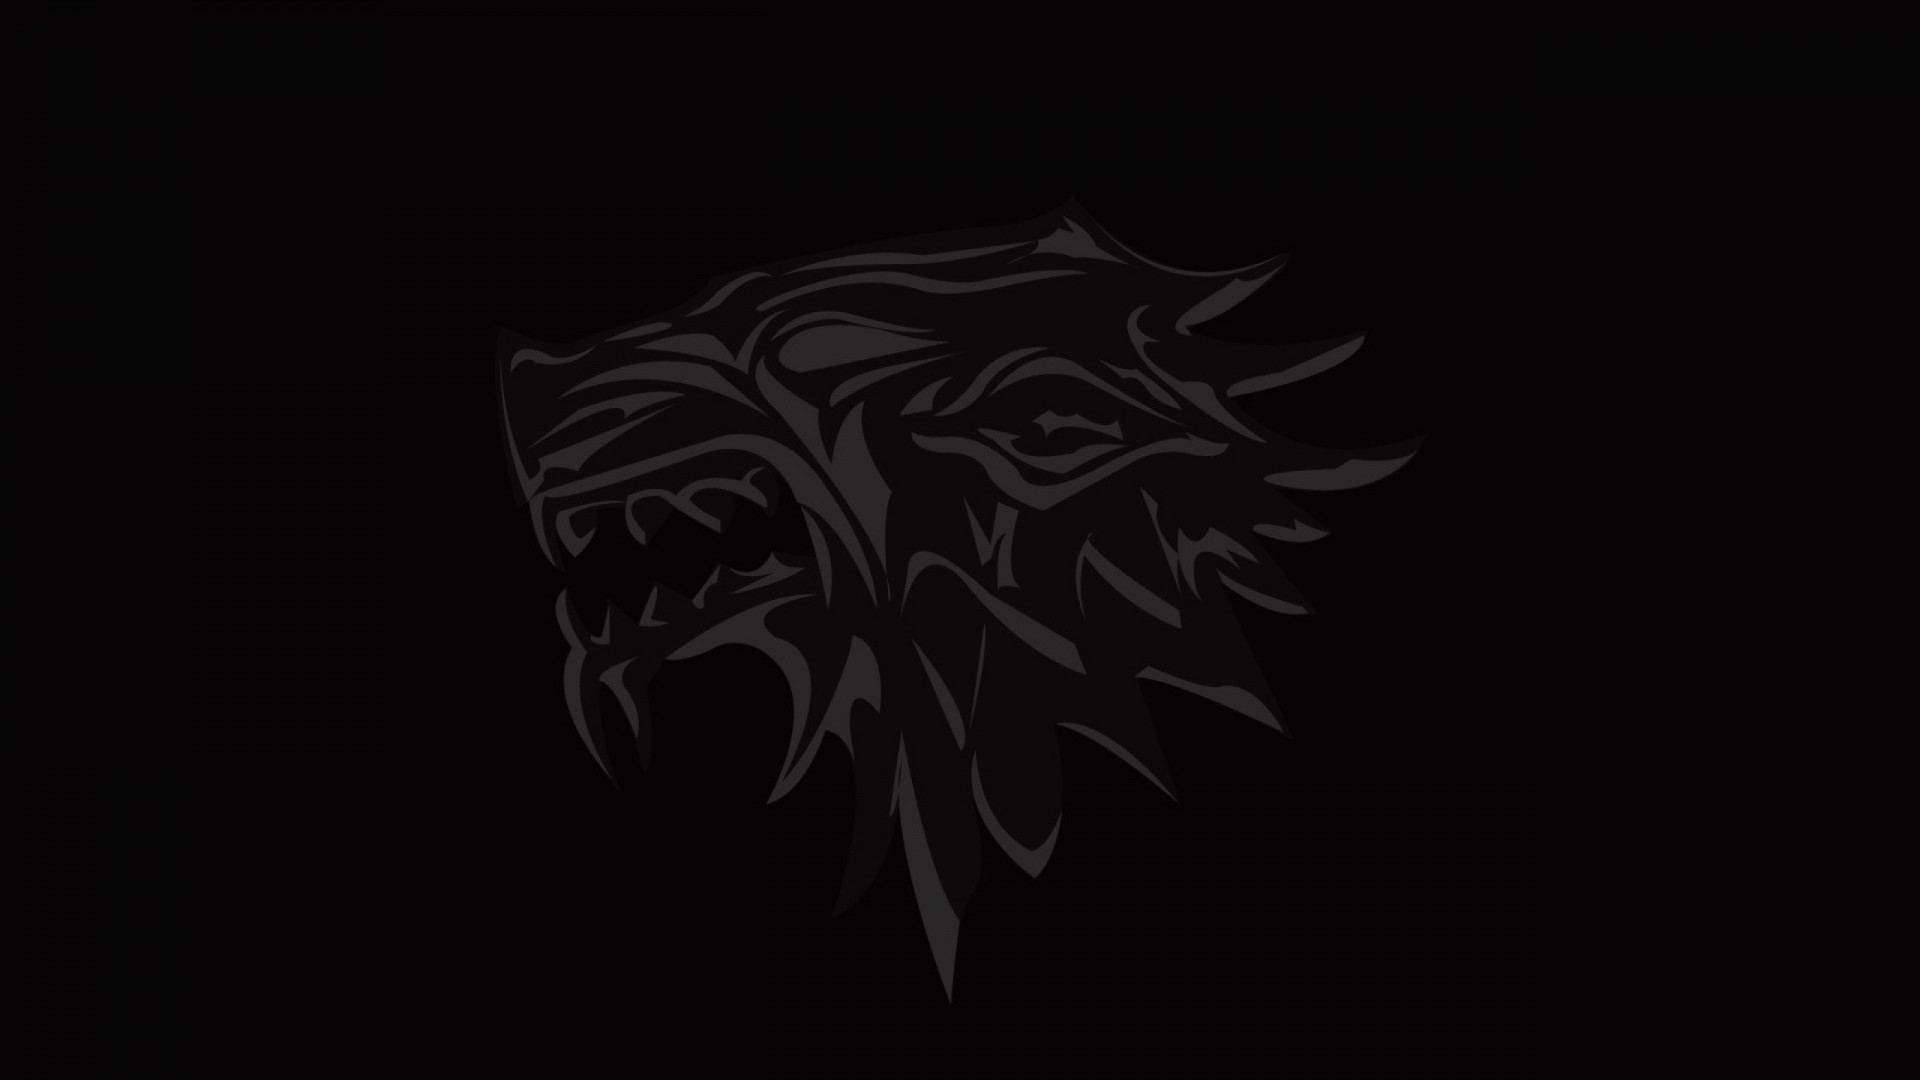 … Background Full HD 1080p. Wallpaper house of stark, game of  thrones, logo, emblem, wolf